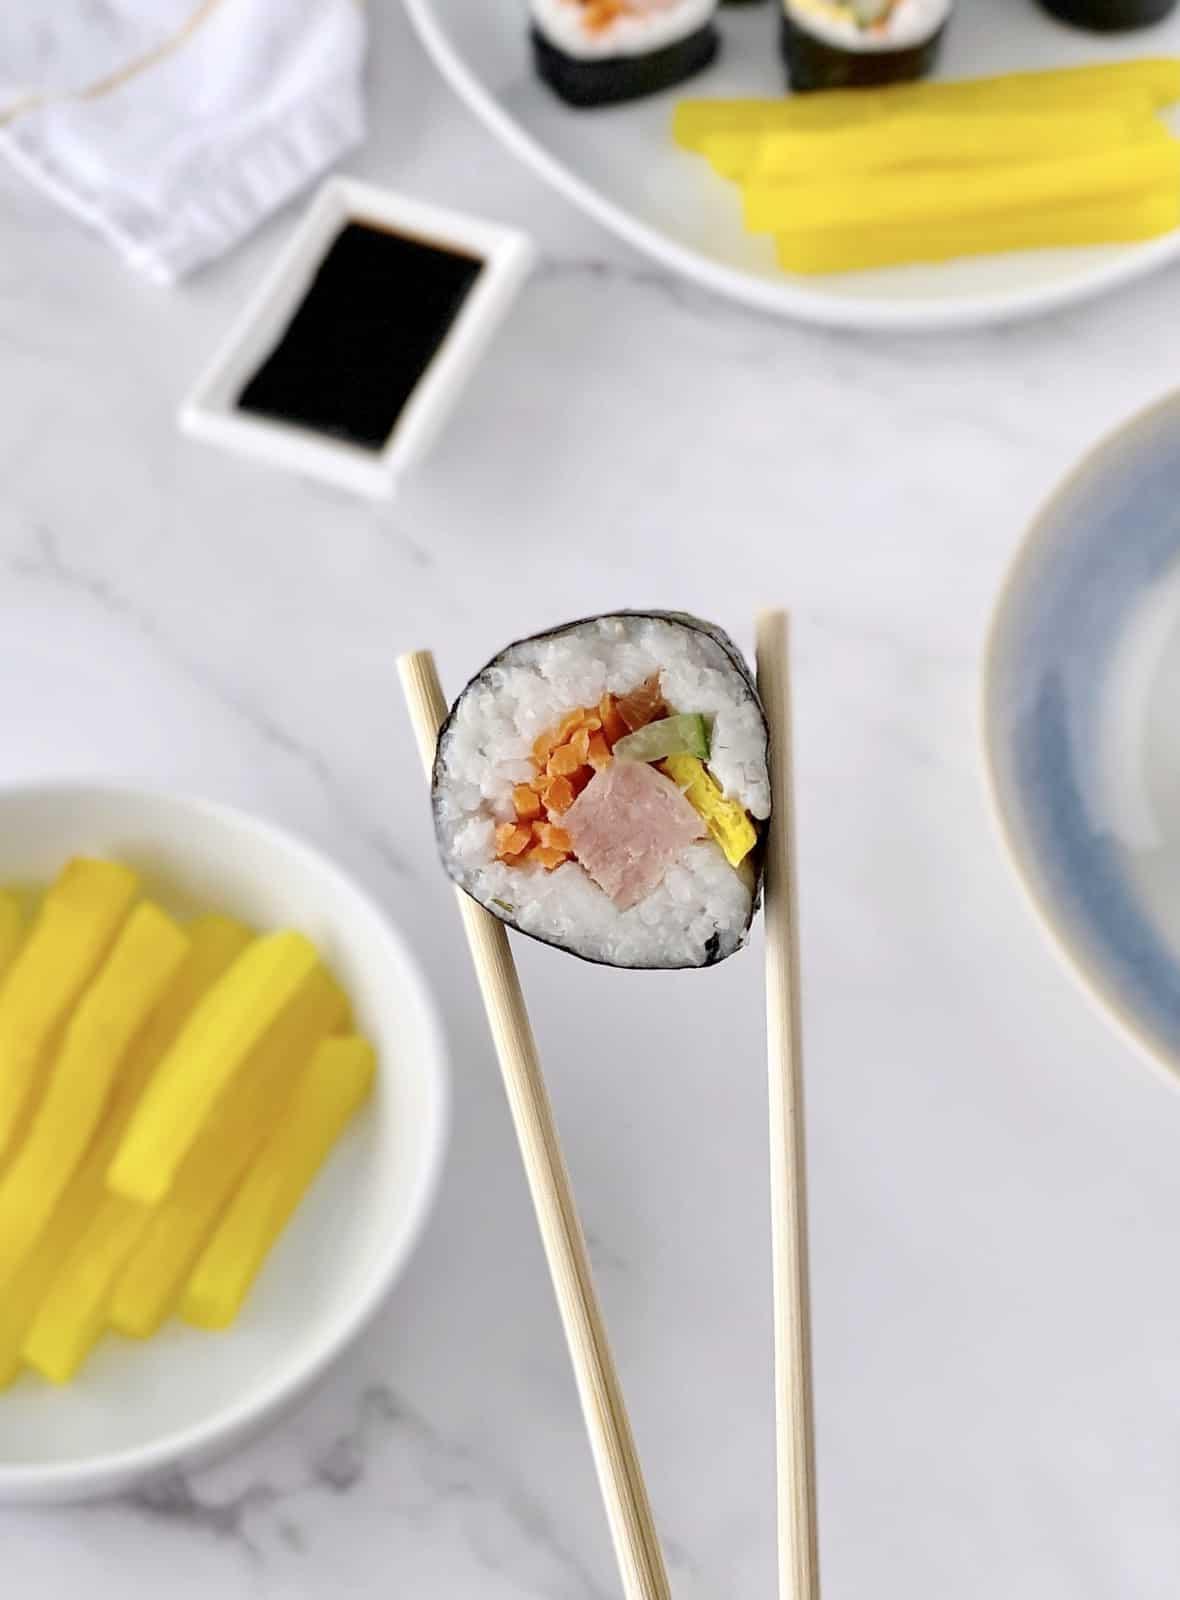 chopstick holding sushi roll